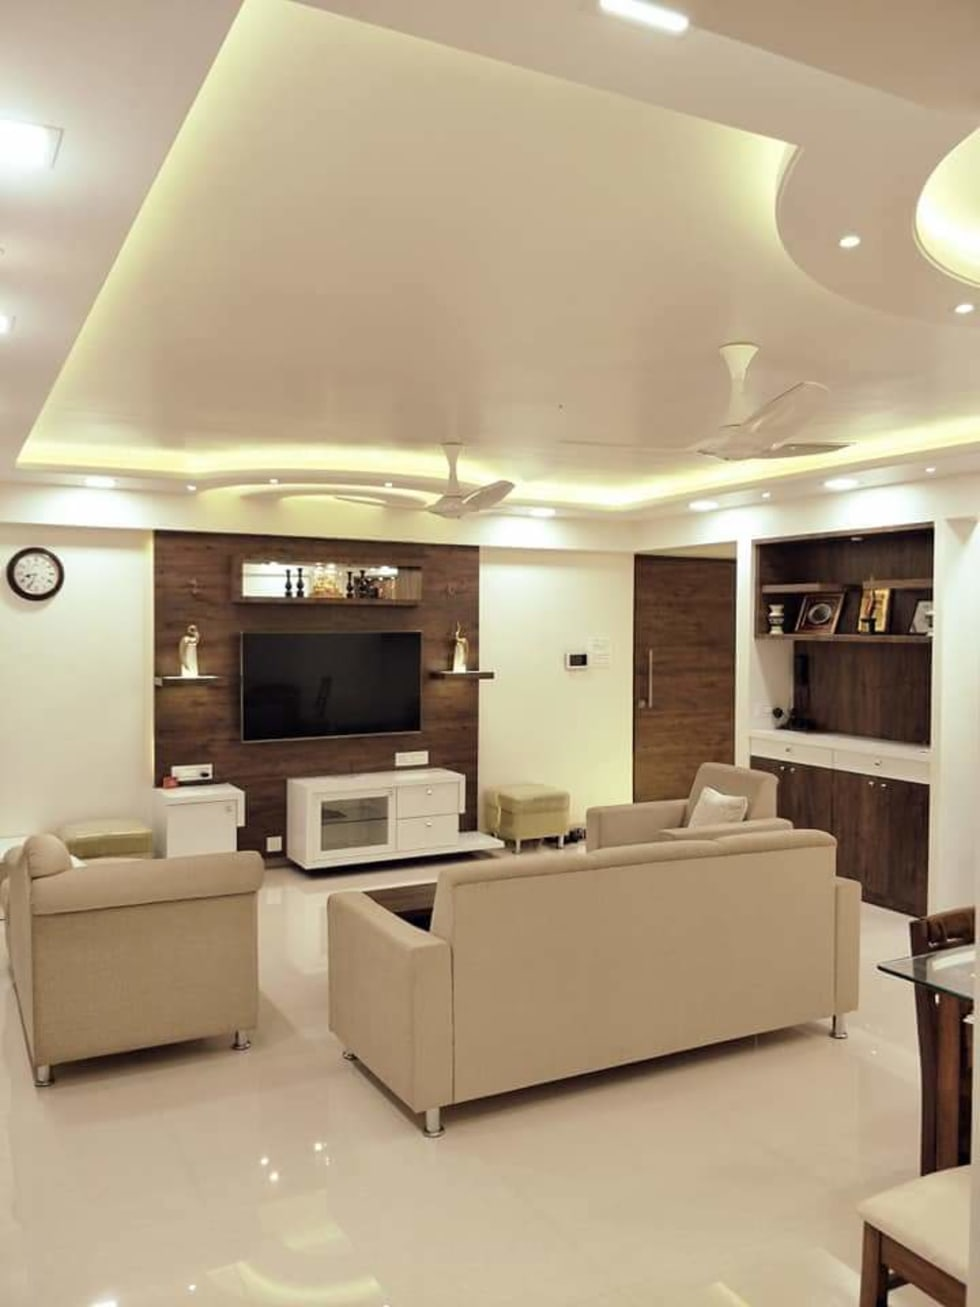 A New Delhi home with bright design ideas and colour schemes